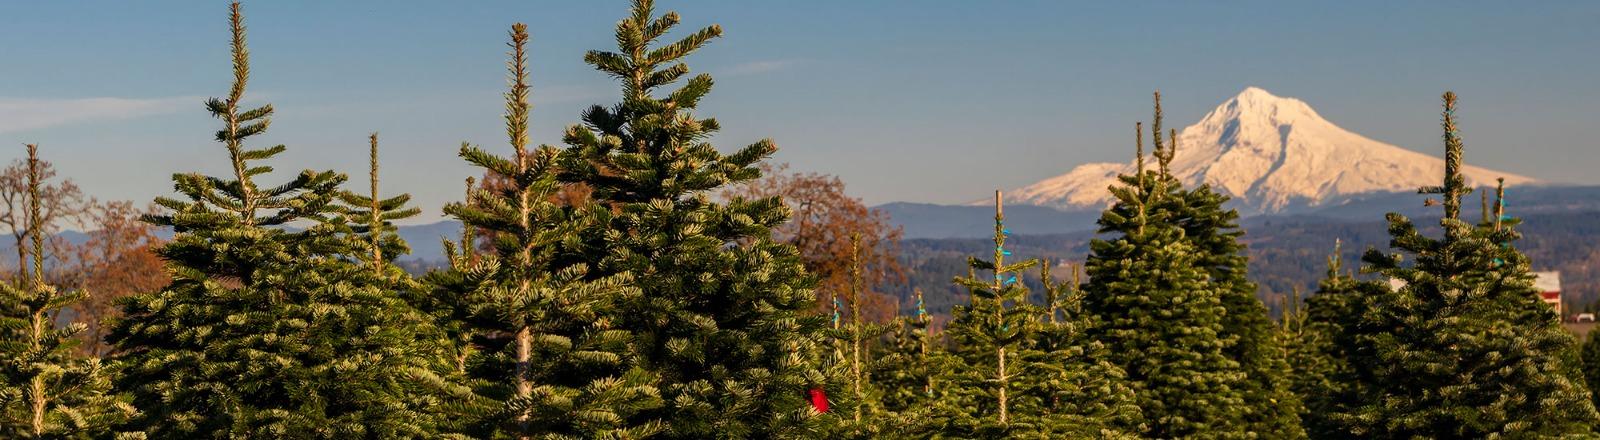 Christmas Tree U Cut 2020 Near Damascus Or Find U cut Christmas Trees in Oregon's Mt Hood Territory